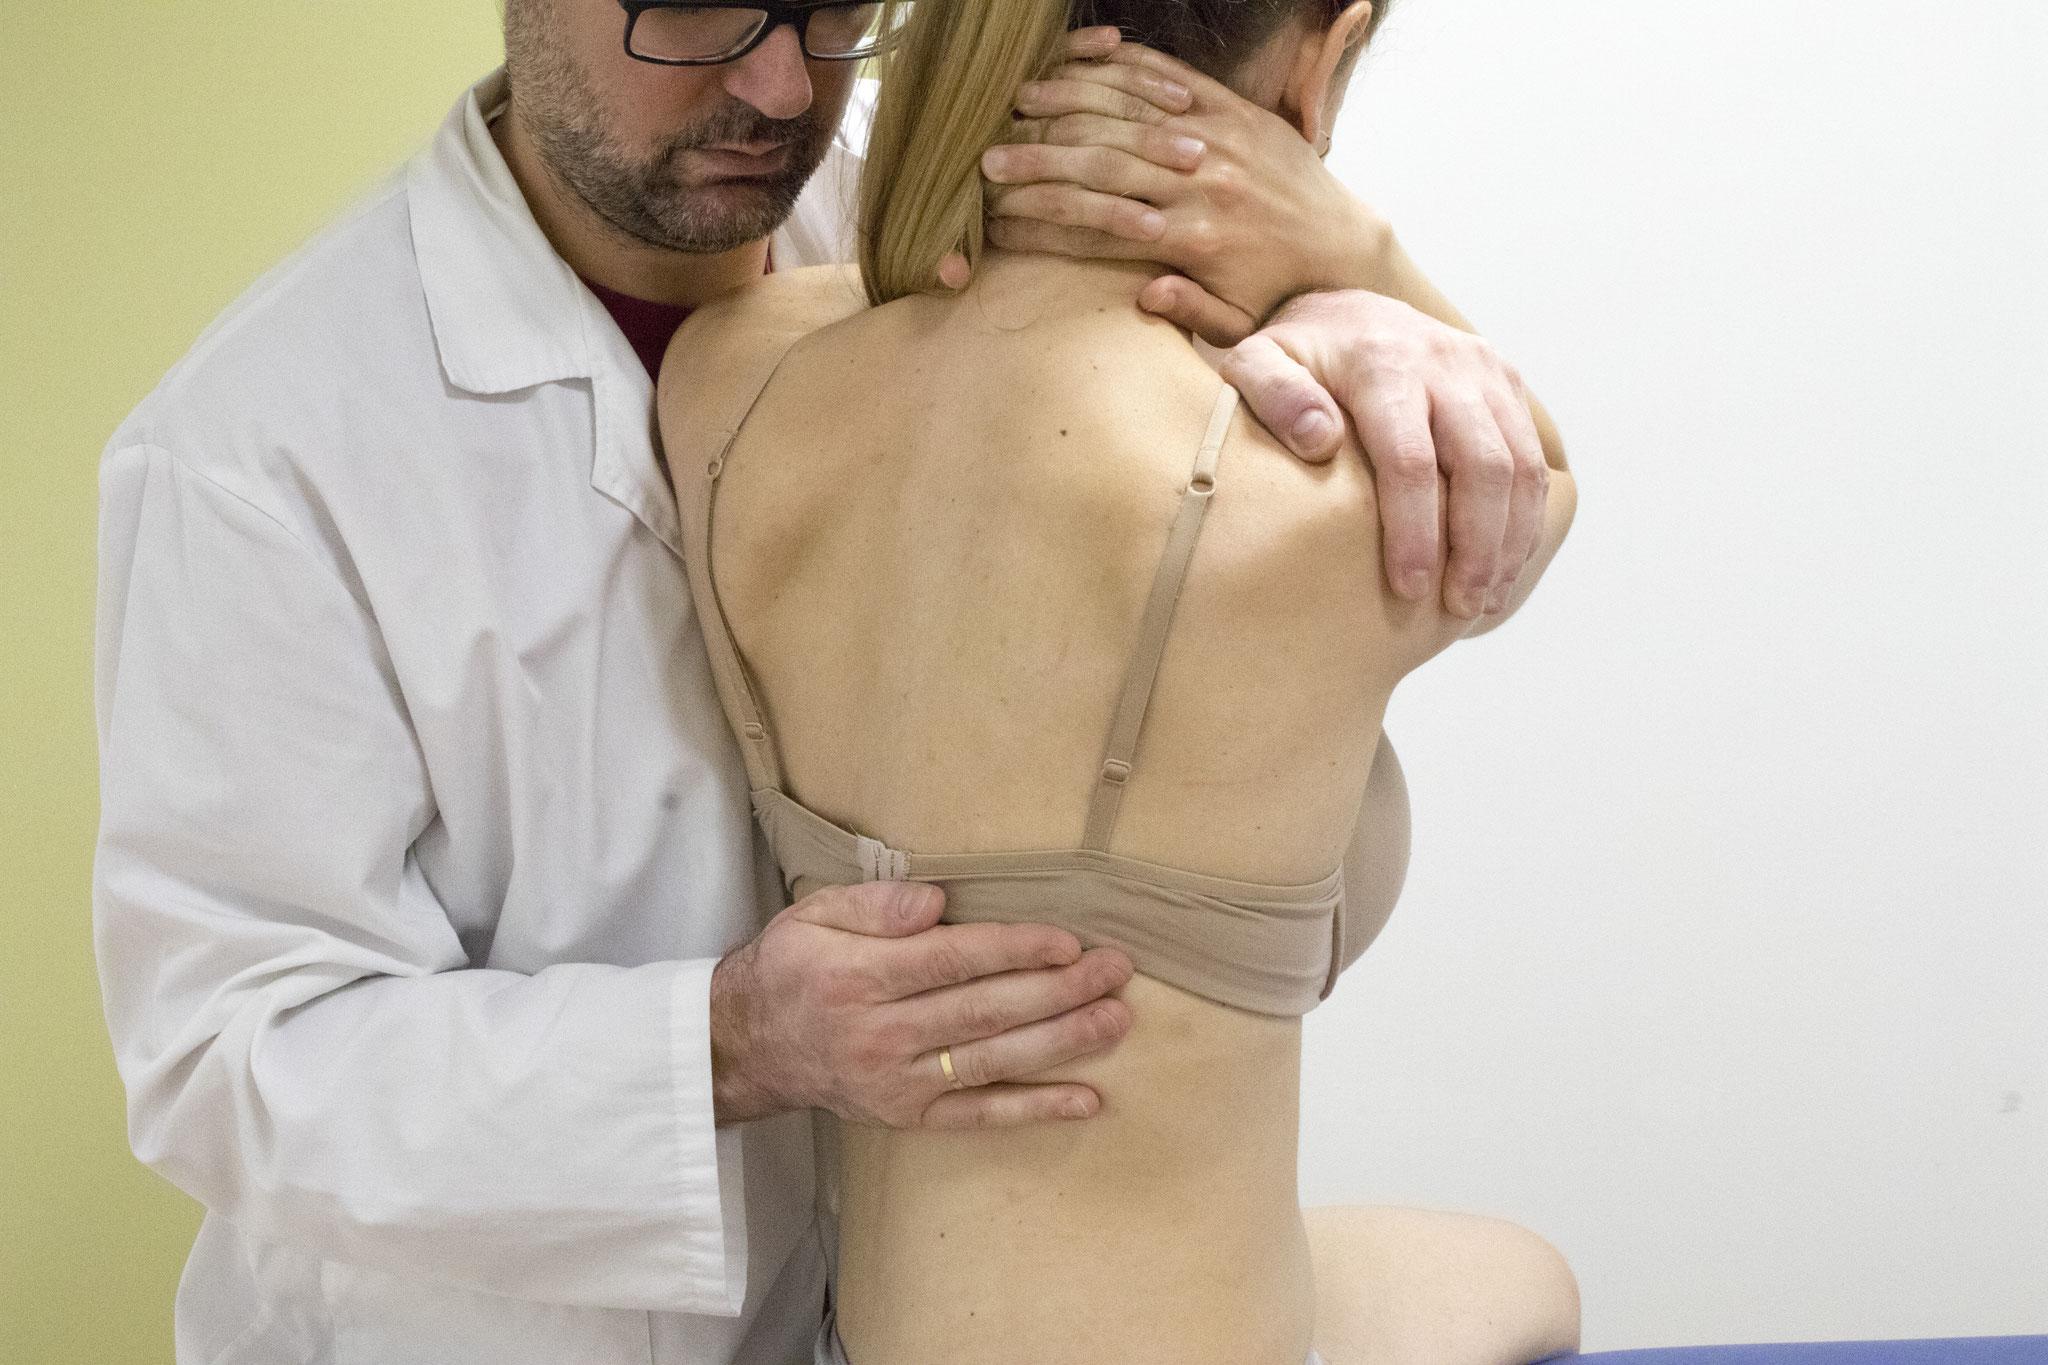 Tecnica manipulativa dorso-lumbar